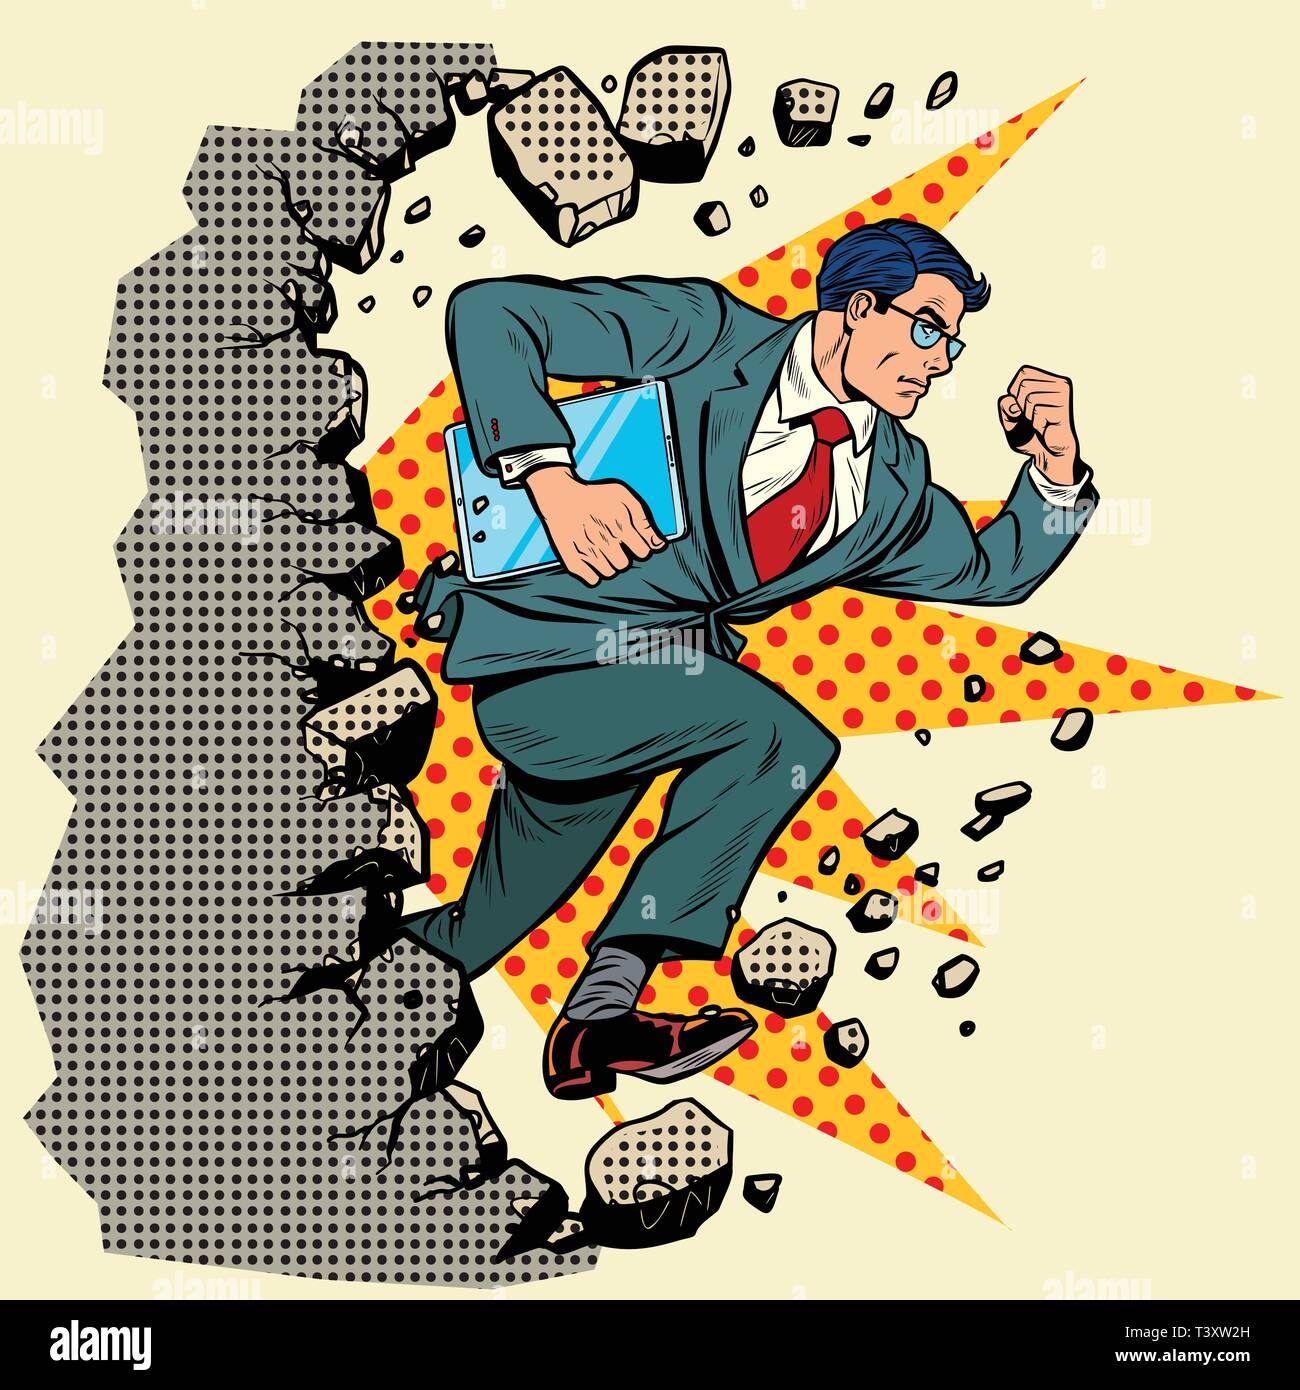 Leader gadget novation breaks a wall, destroys stereotypes. Moving forward, personal development. Pop art retro vector illustration vintage kitsch - Stock Vector